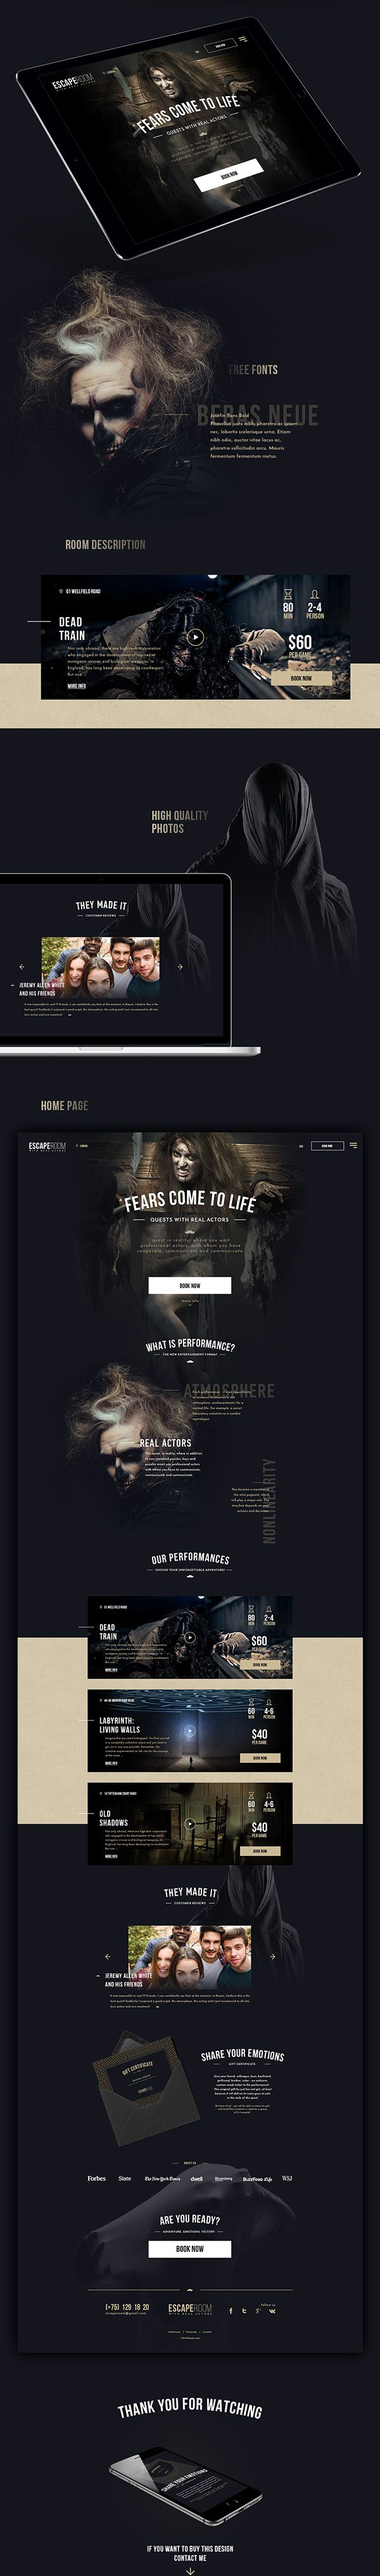 Escape room. Webdesign / website.